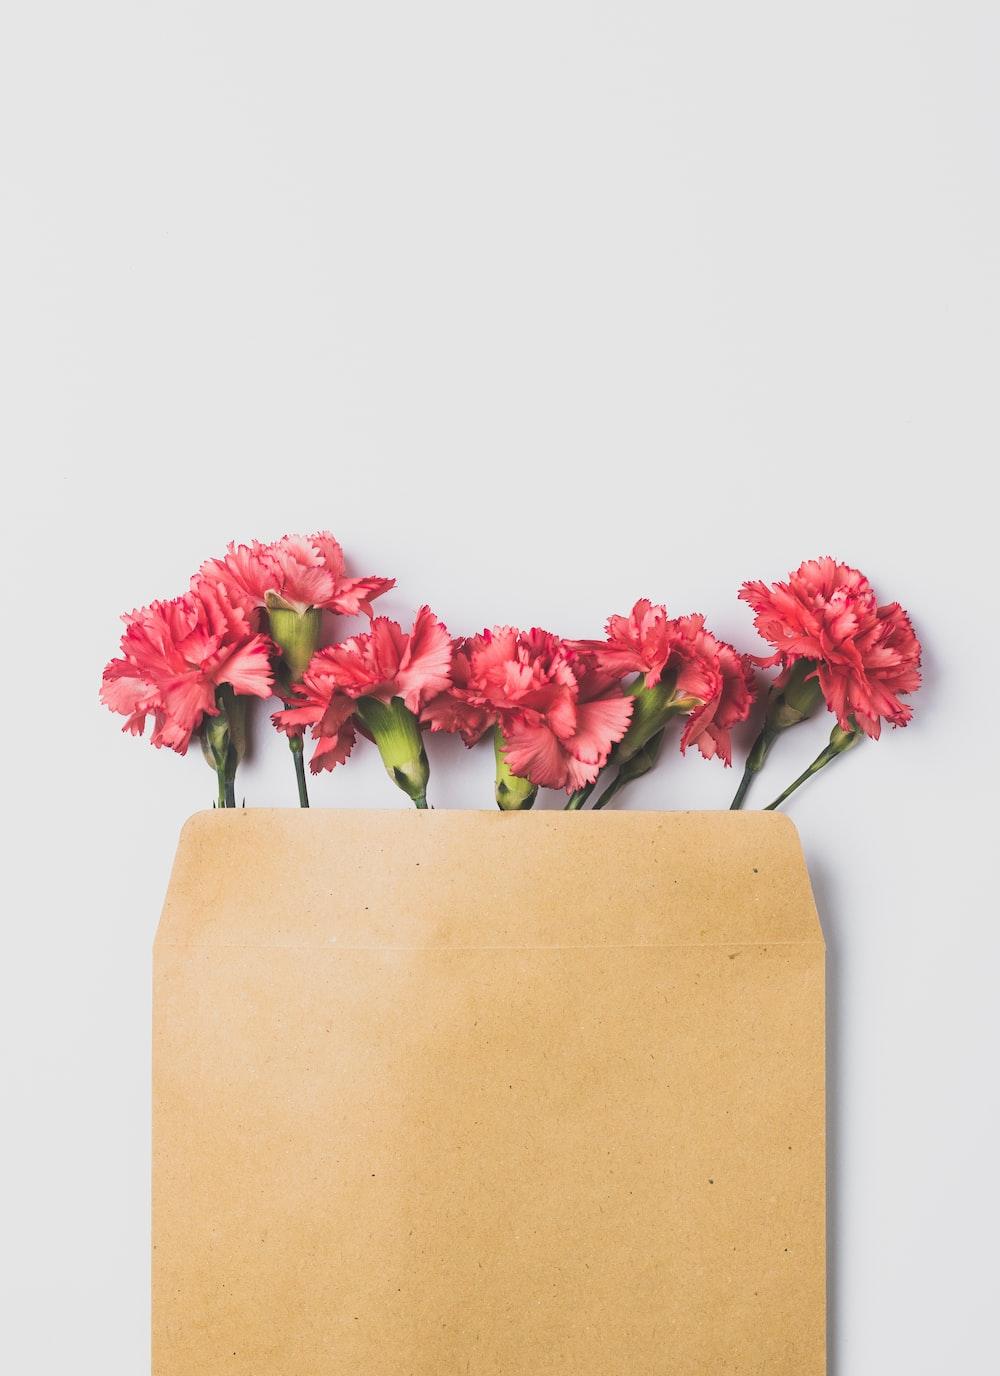 pink roses on brown paper bag